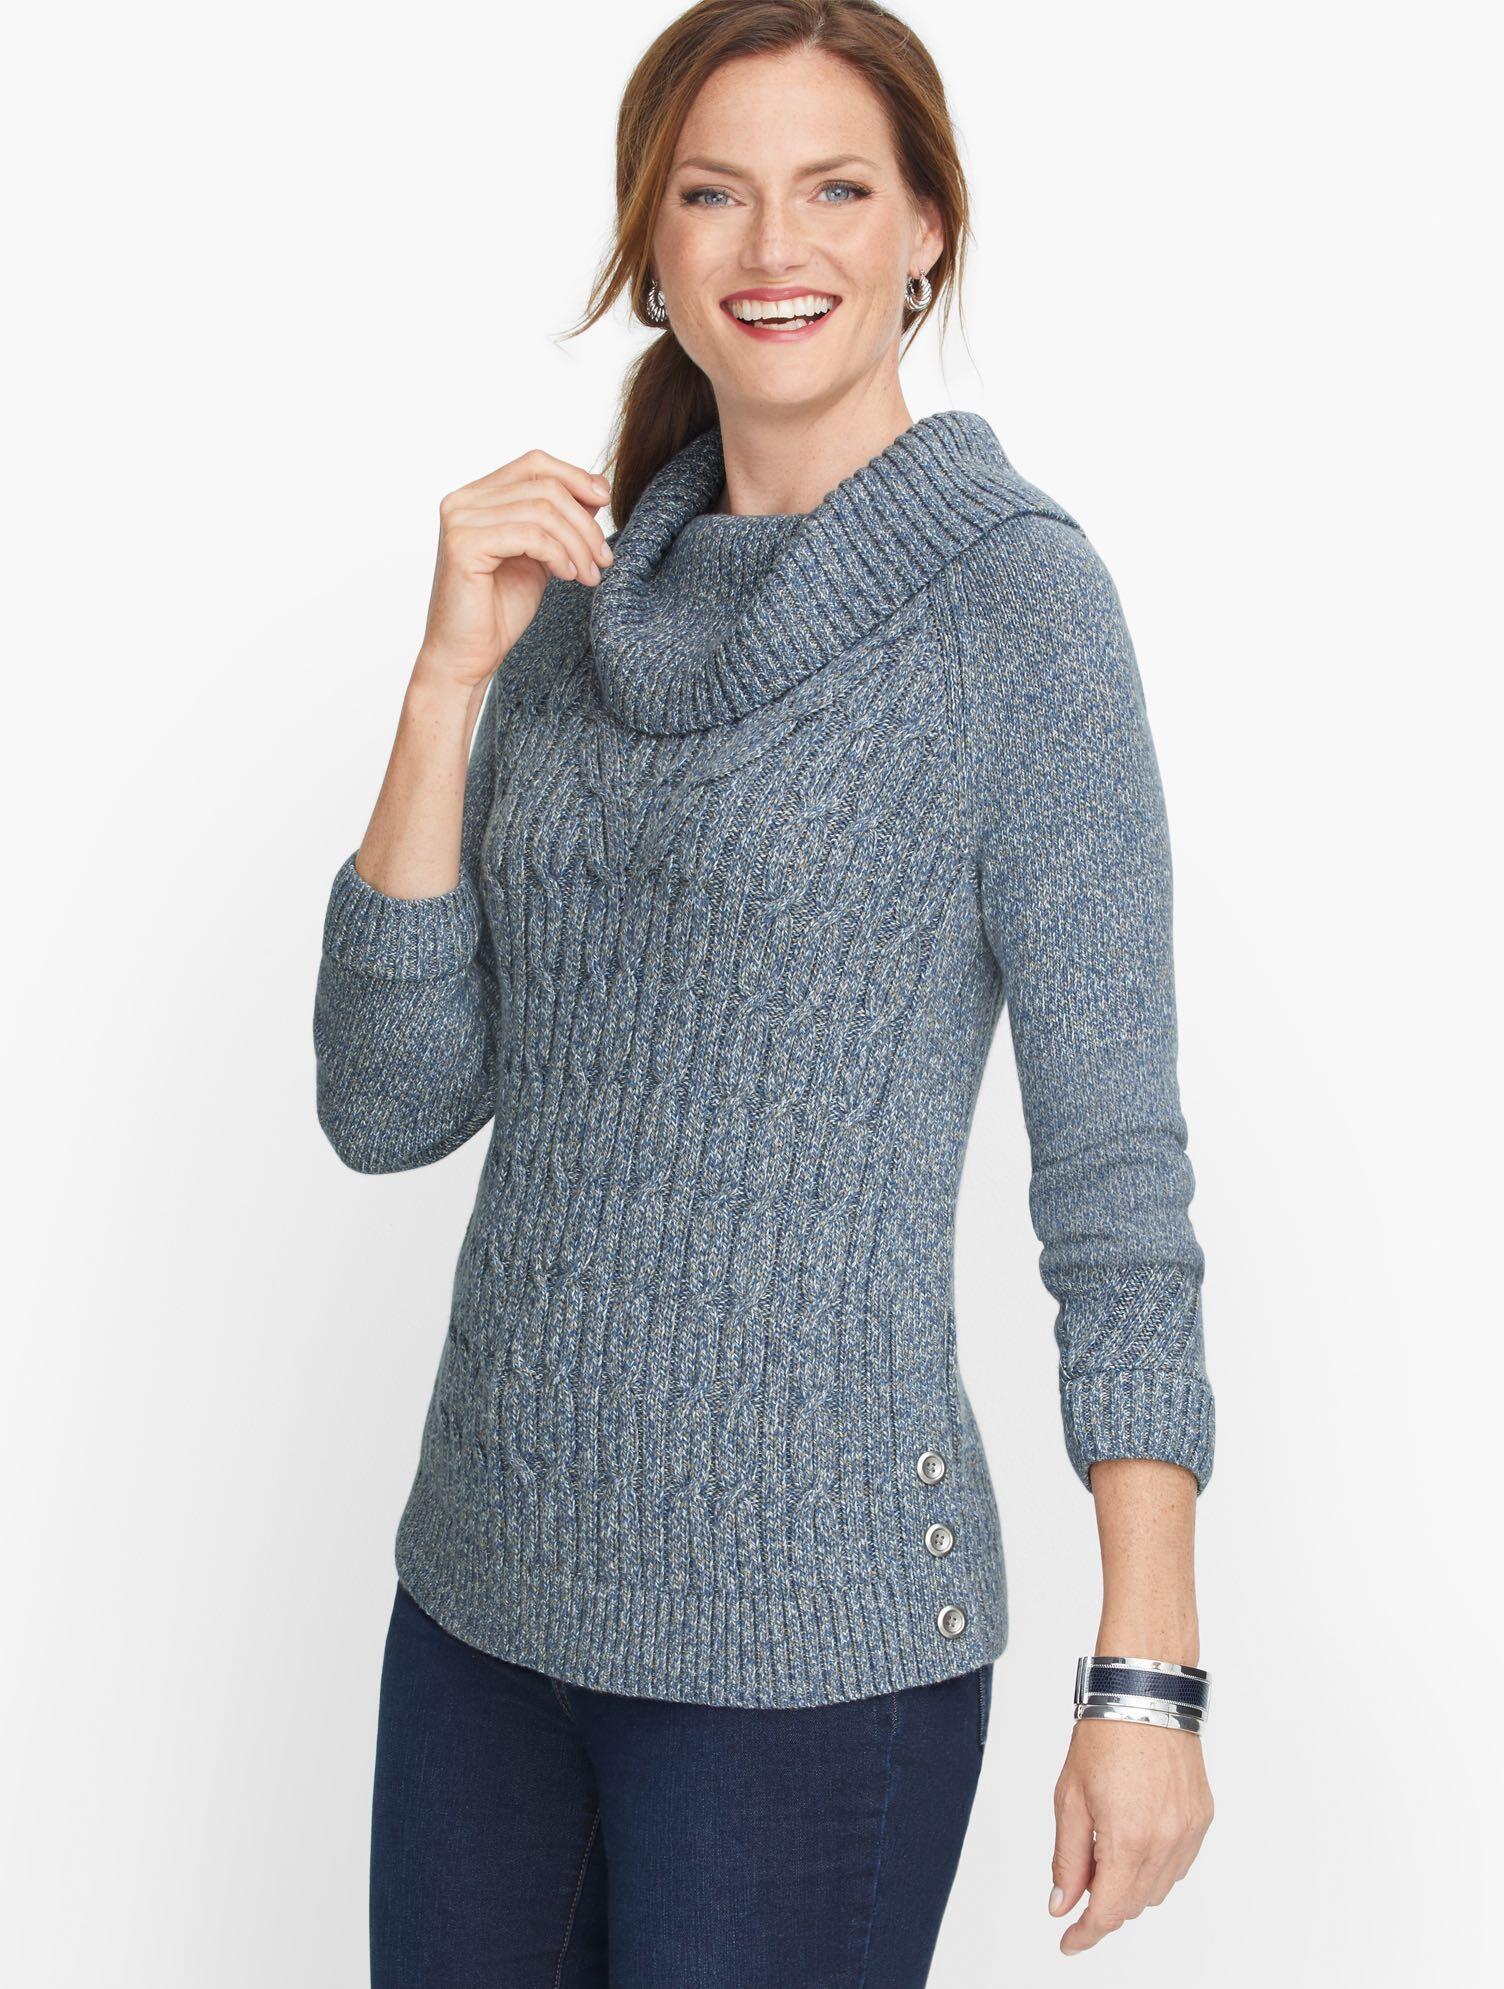 Talbots Cable Cowlneck Sweater - Marl - Mariner Blue - Medium - 100% Cotton Talbots  - Mariner Blue - Size: female - Size: Medium